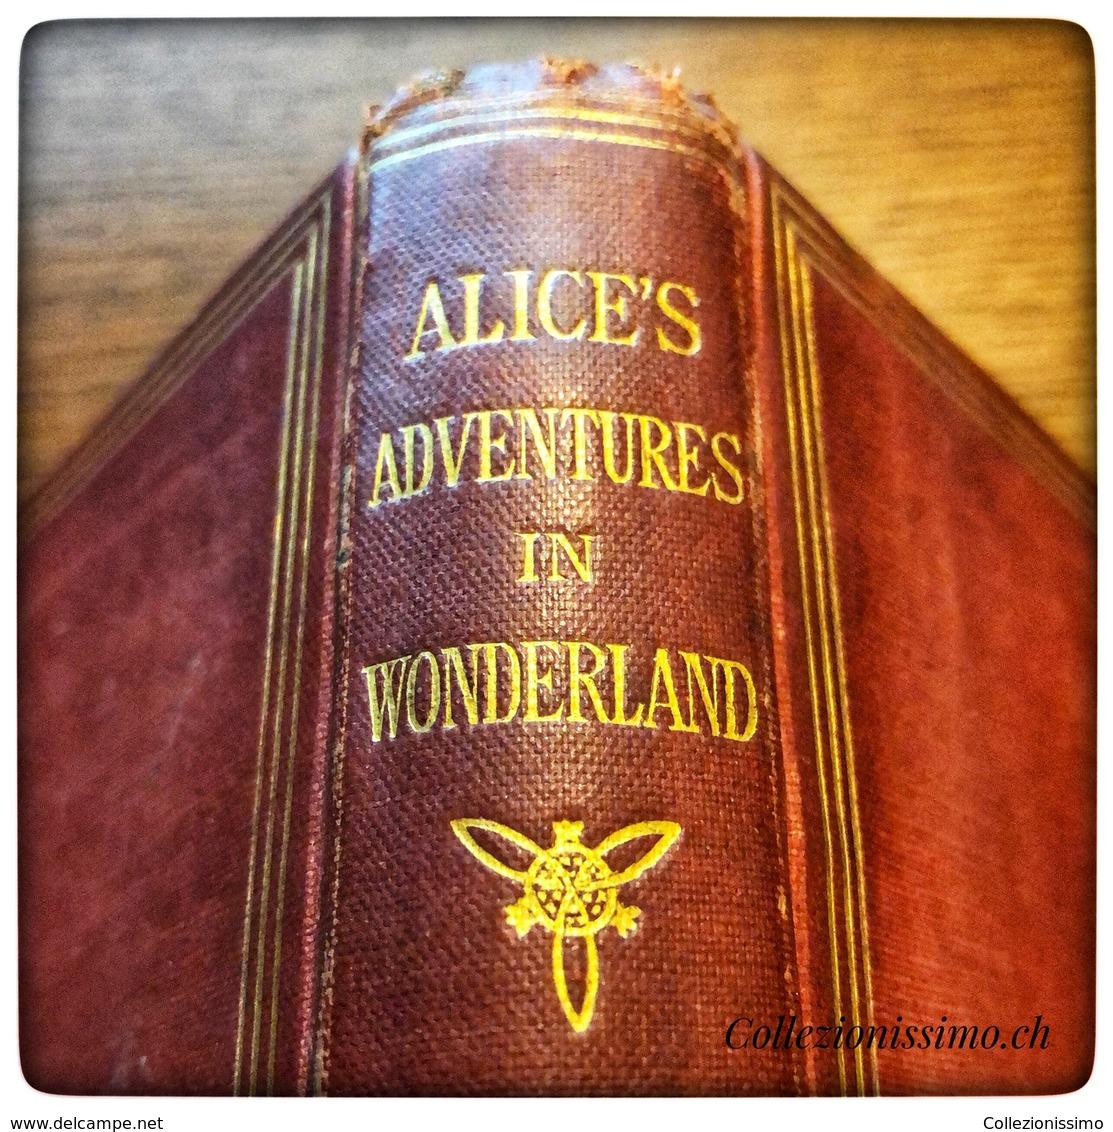 Alice's Adventures In Wonderland, Lewis Carroll, 1872 Twenty-ninth Thousand - Oude Boeken